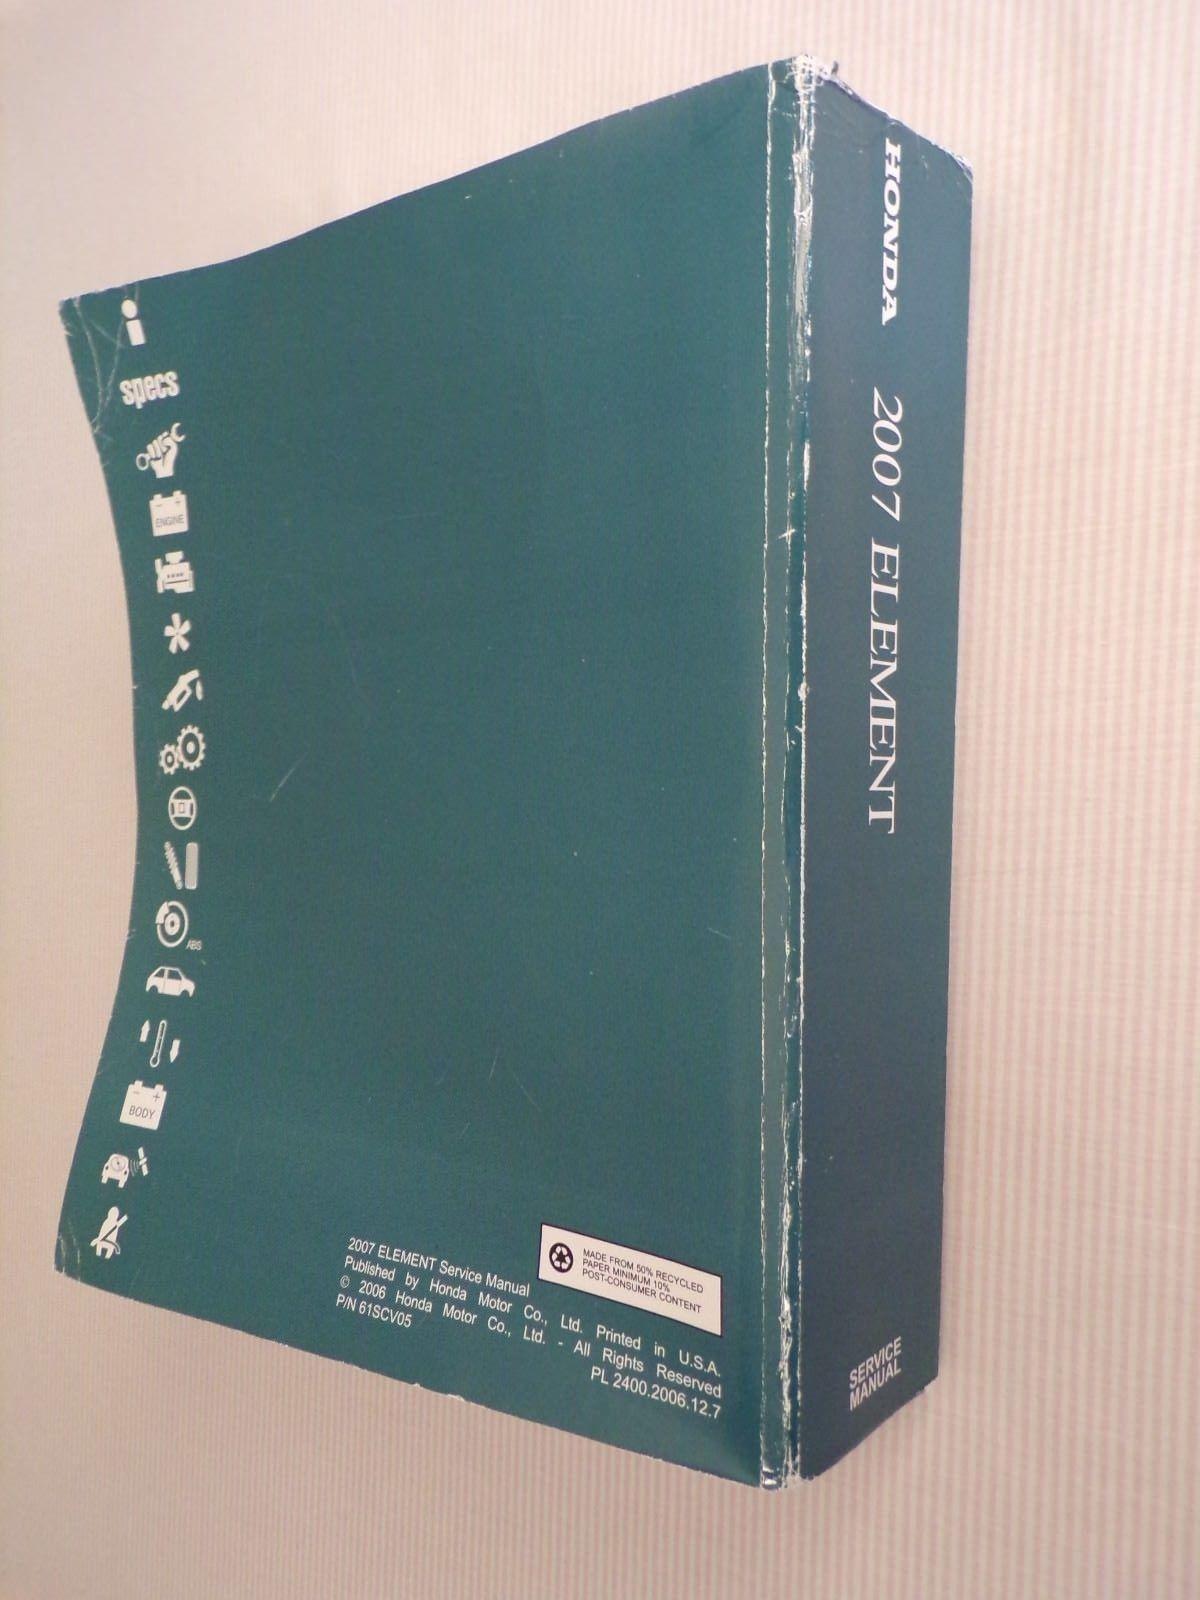 2007 honda element service manual paperback and 50 similar items rh bonanza com 2007 honda element owners manual pdf Honda Element Maintenance